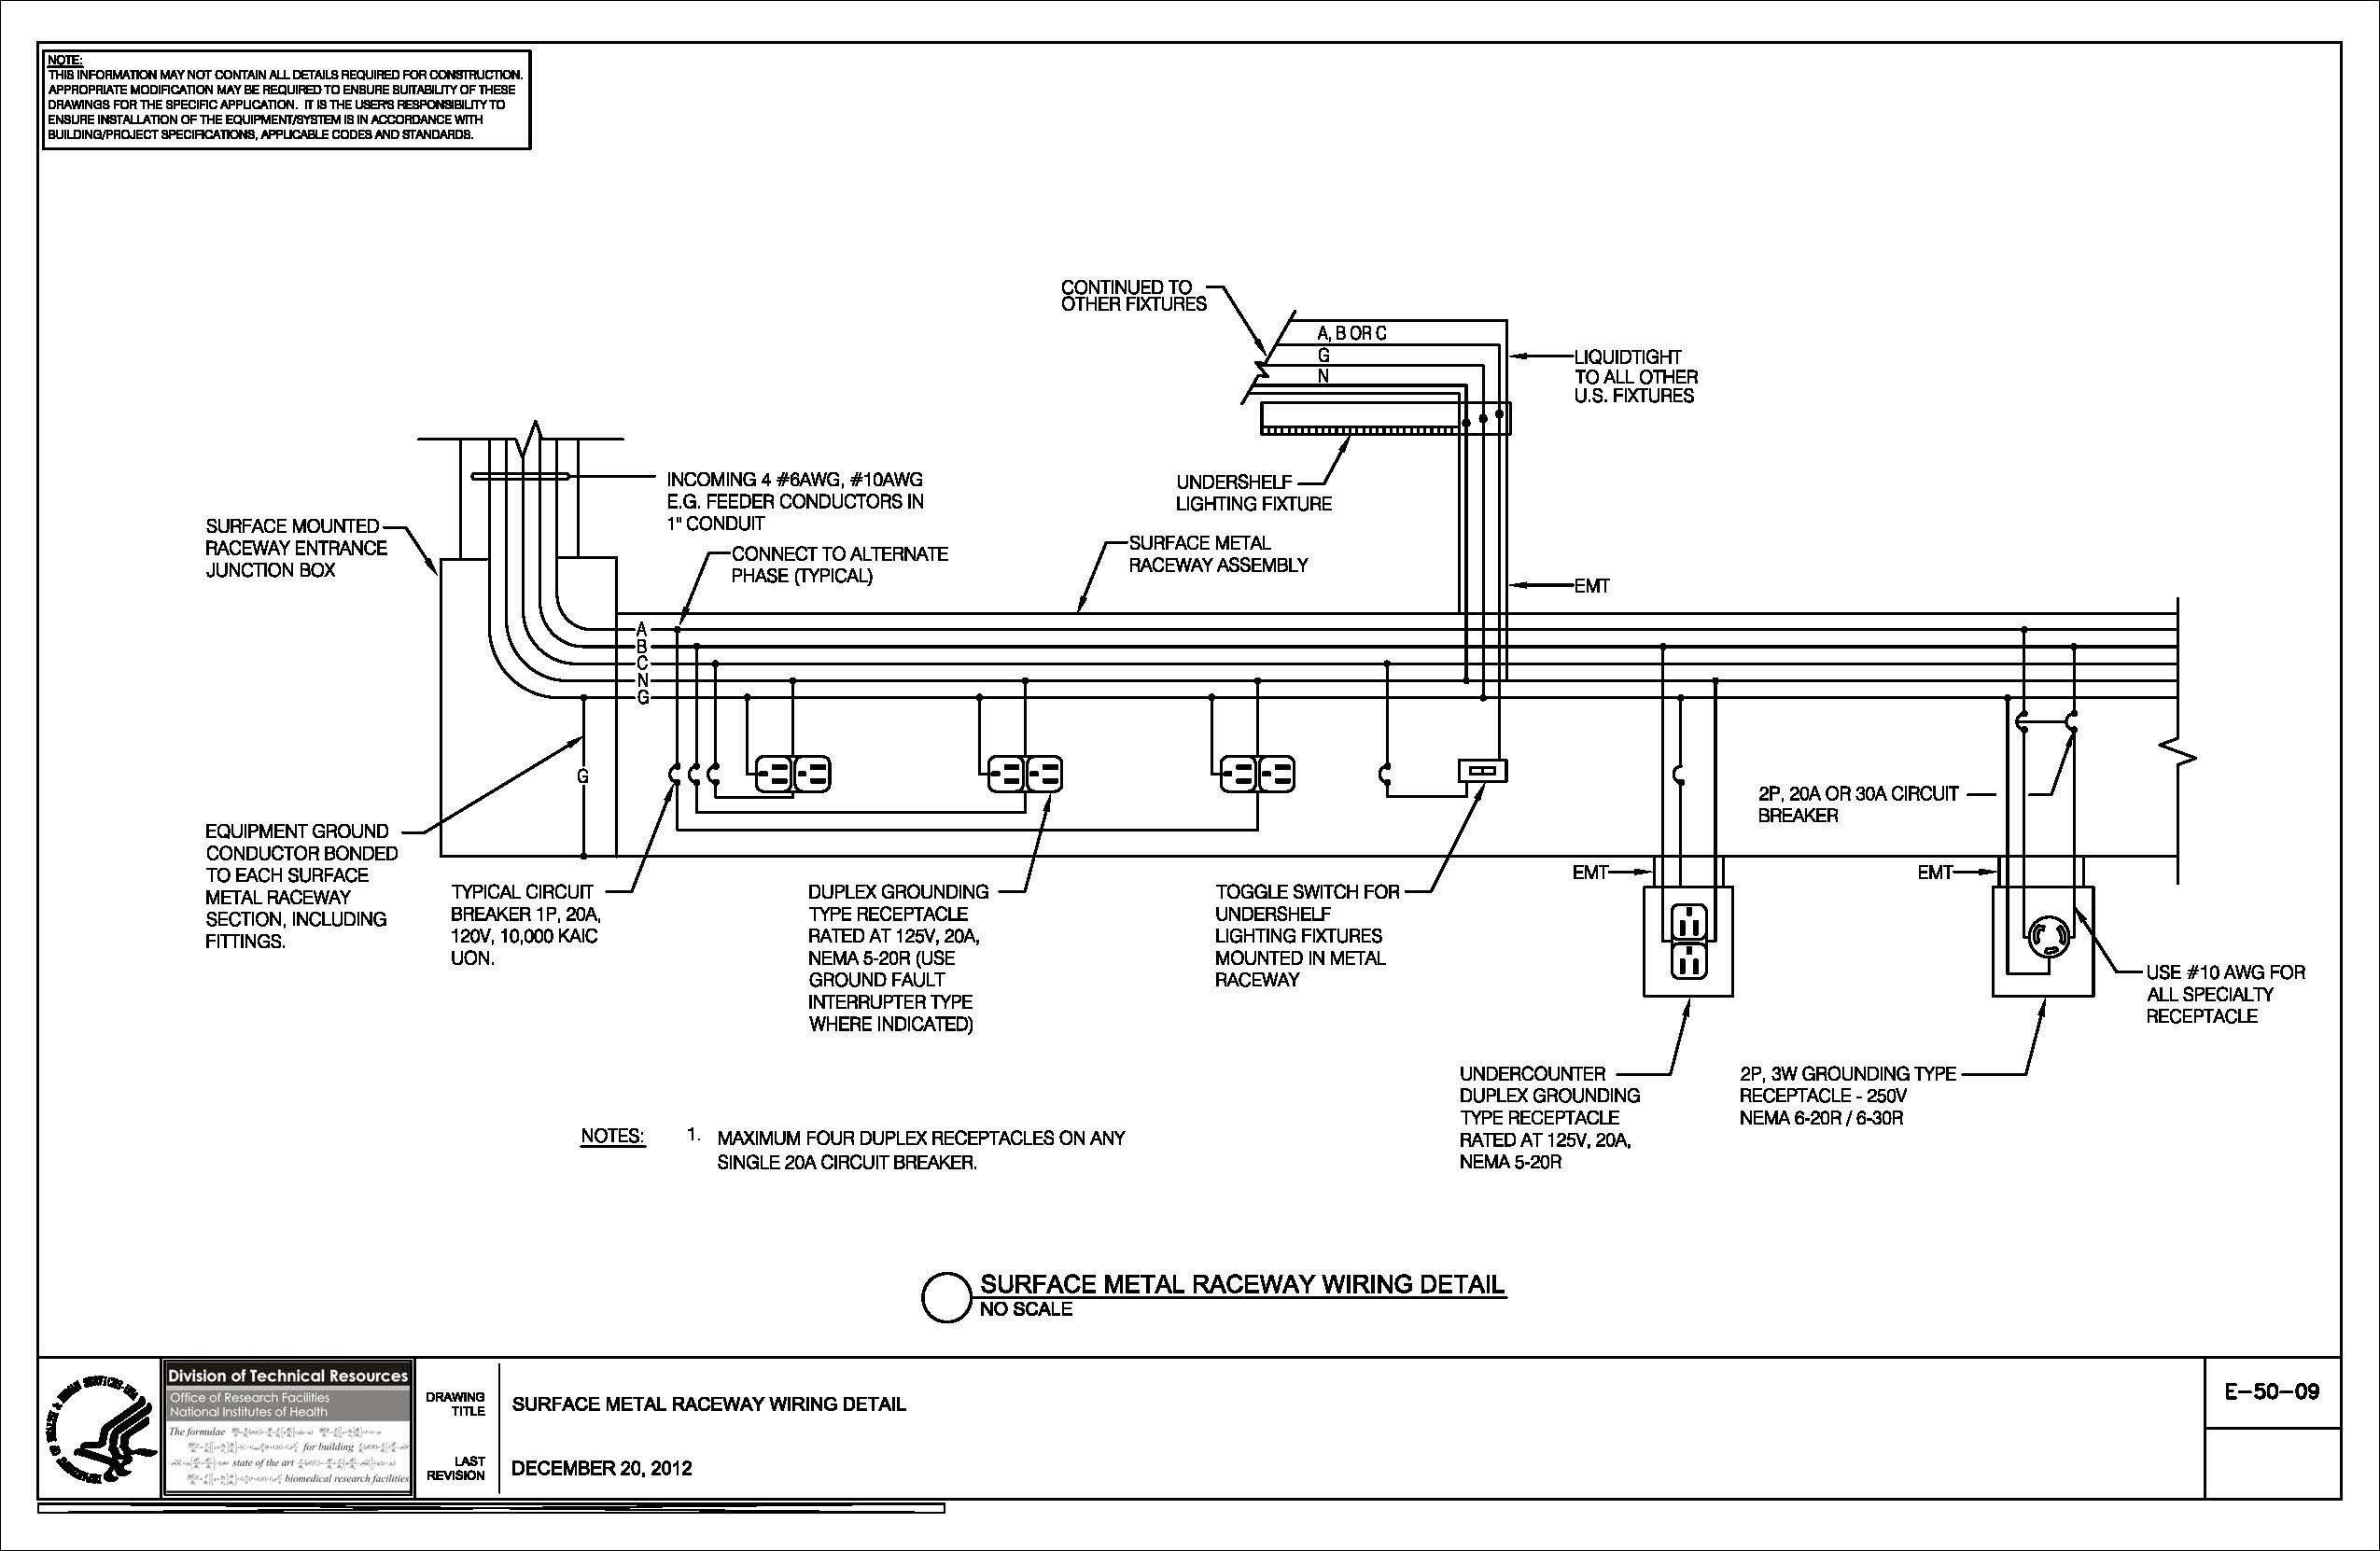 power system wiring diagram on pole barn electrical wiring diagram rh lsoncology co Pole Barn Construction